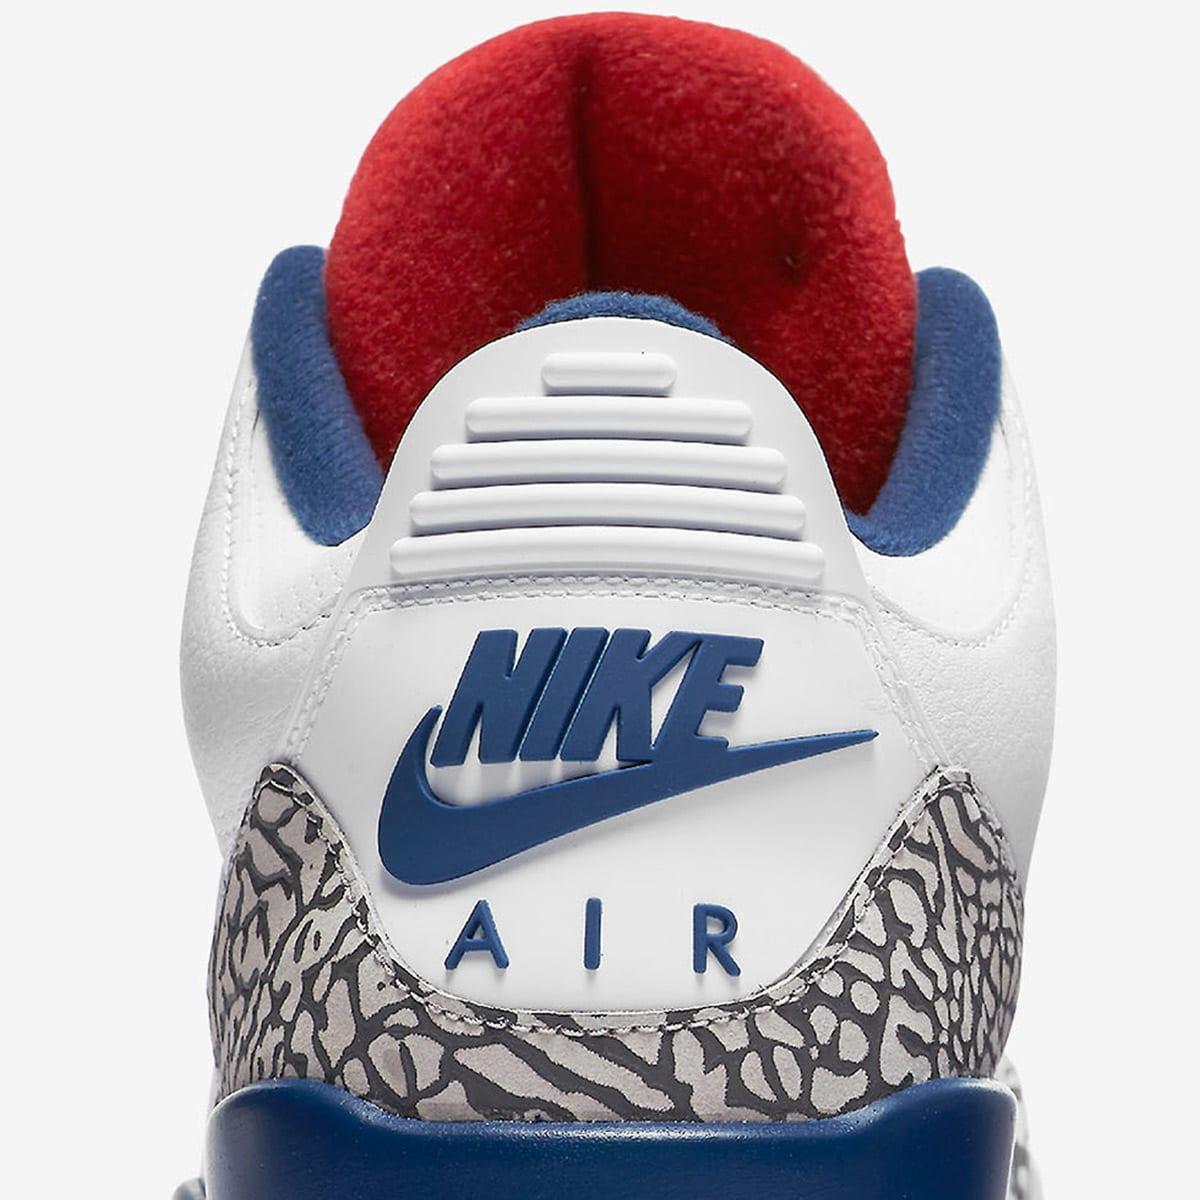 new arrival 3f4c3 441aa Nike Air Jordan 3 Retro OG